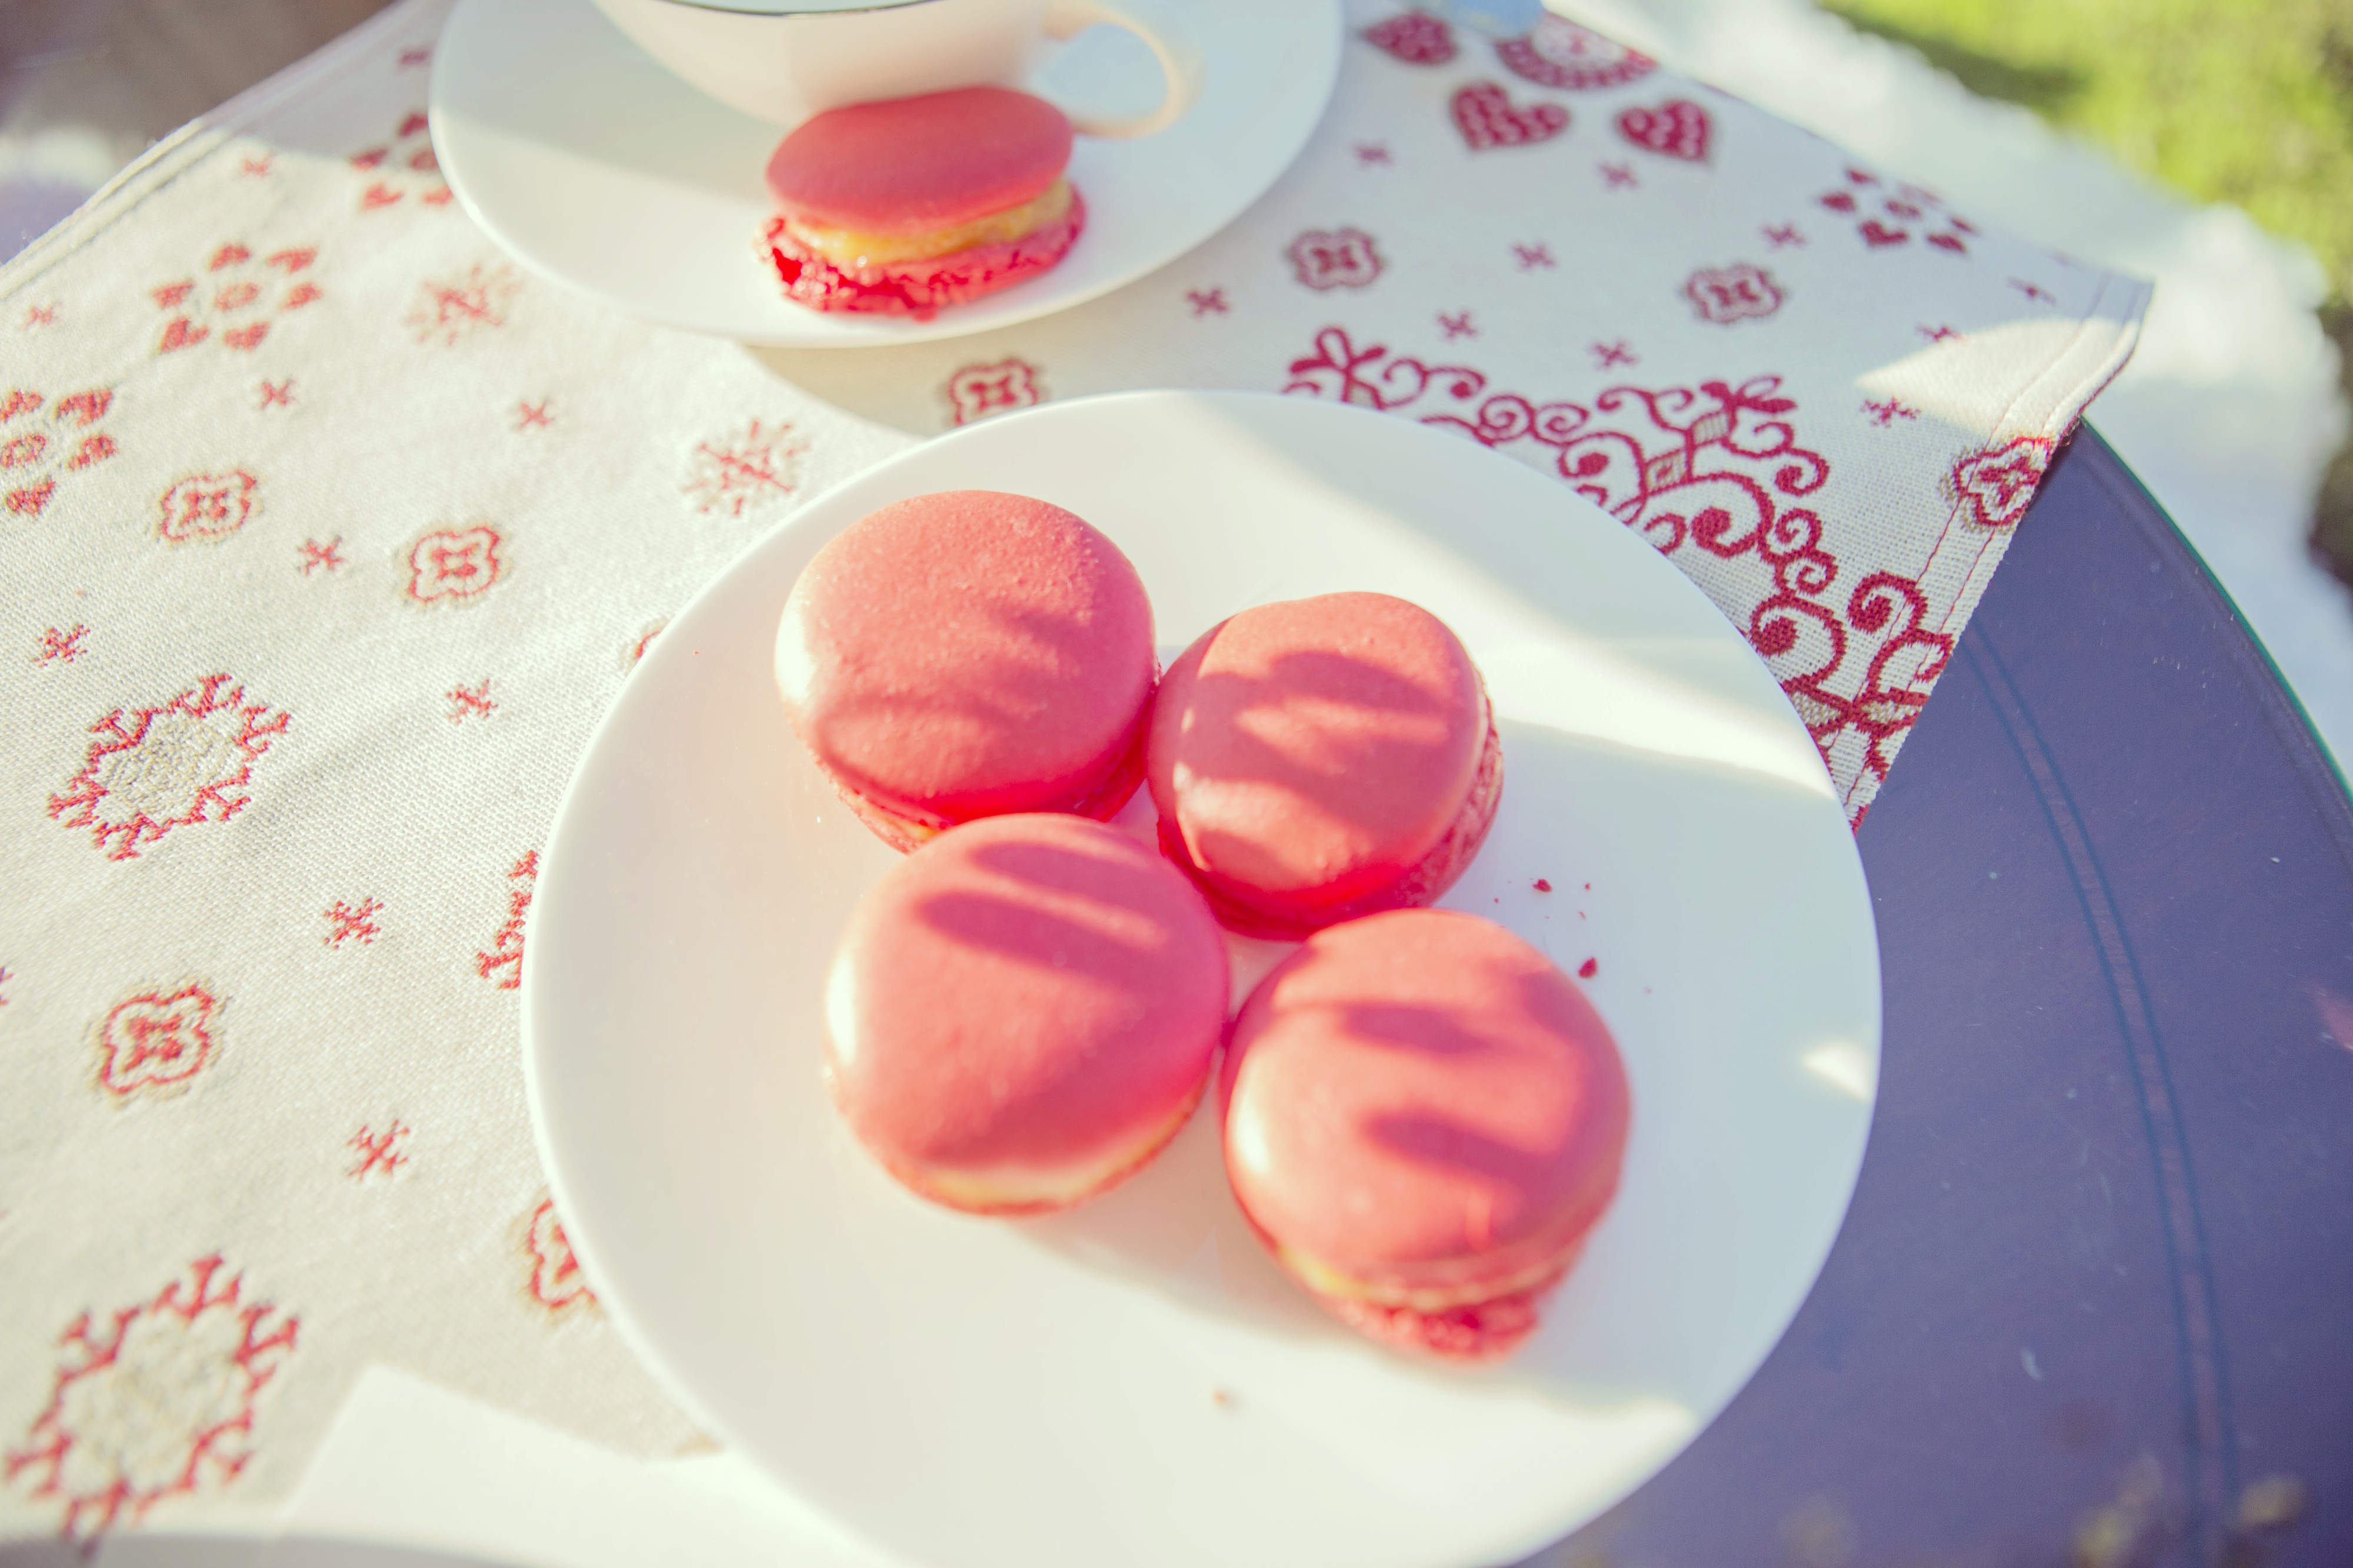 tartas-madina-remezal-blog-de-moda-fashionista-chicadicta-macarons-para-bodas-chic-adicta-patricia-knabe-fotografa-de-novias-piensaenchic-piensa-en-chic